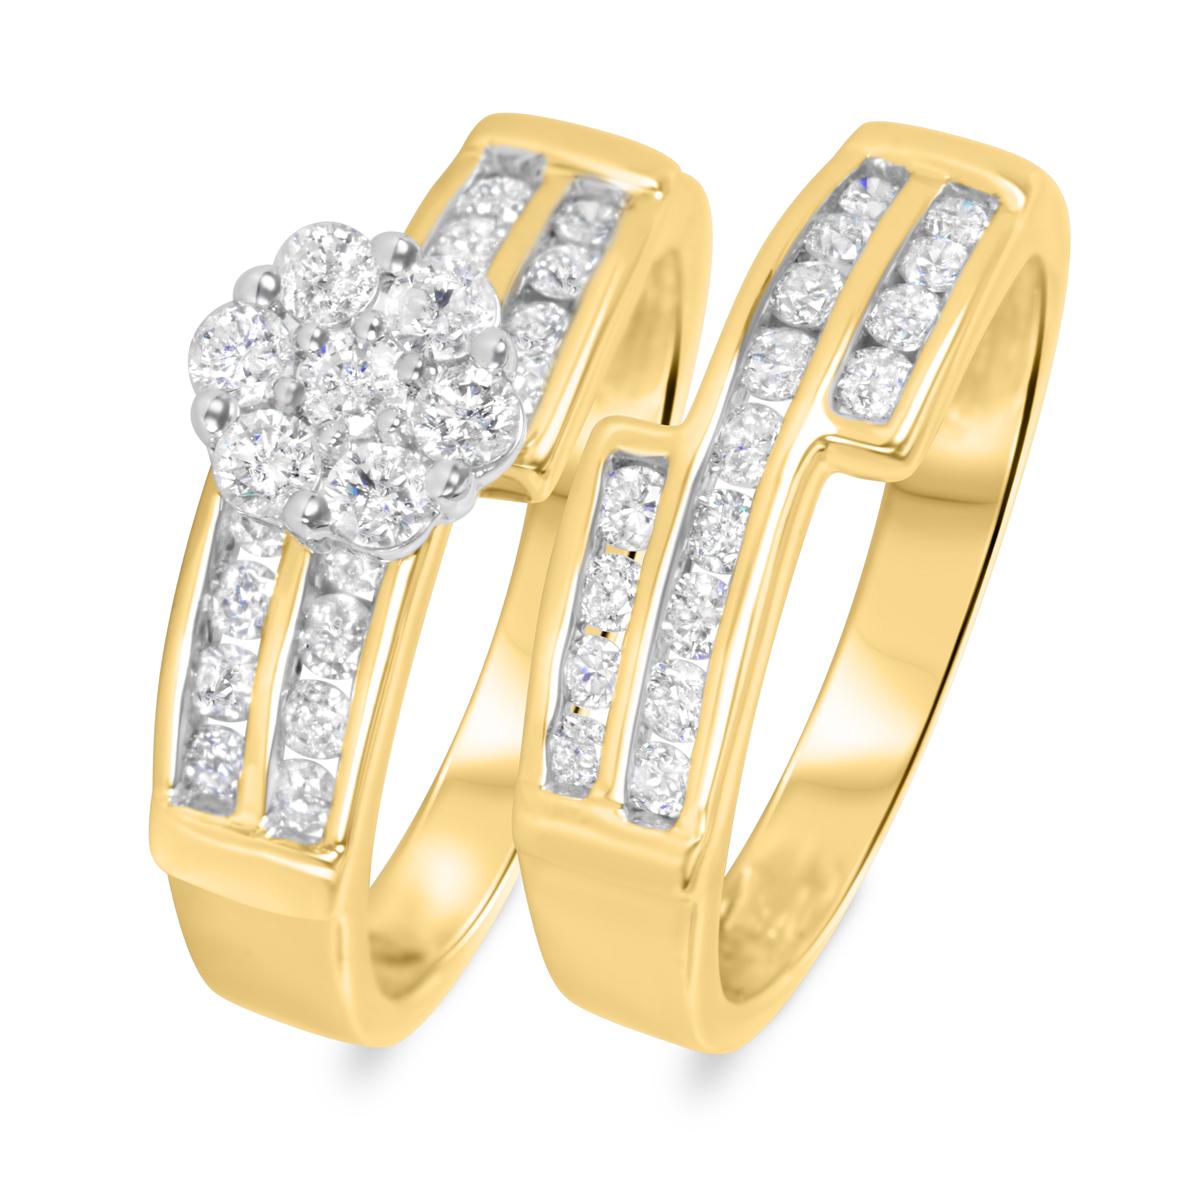 1 1/10 CT. T.W. Round Cut Diamond Ladies Bridal Wedding Ring Set 10K Yellow Gold